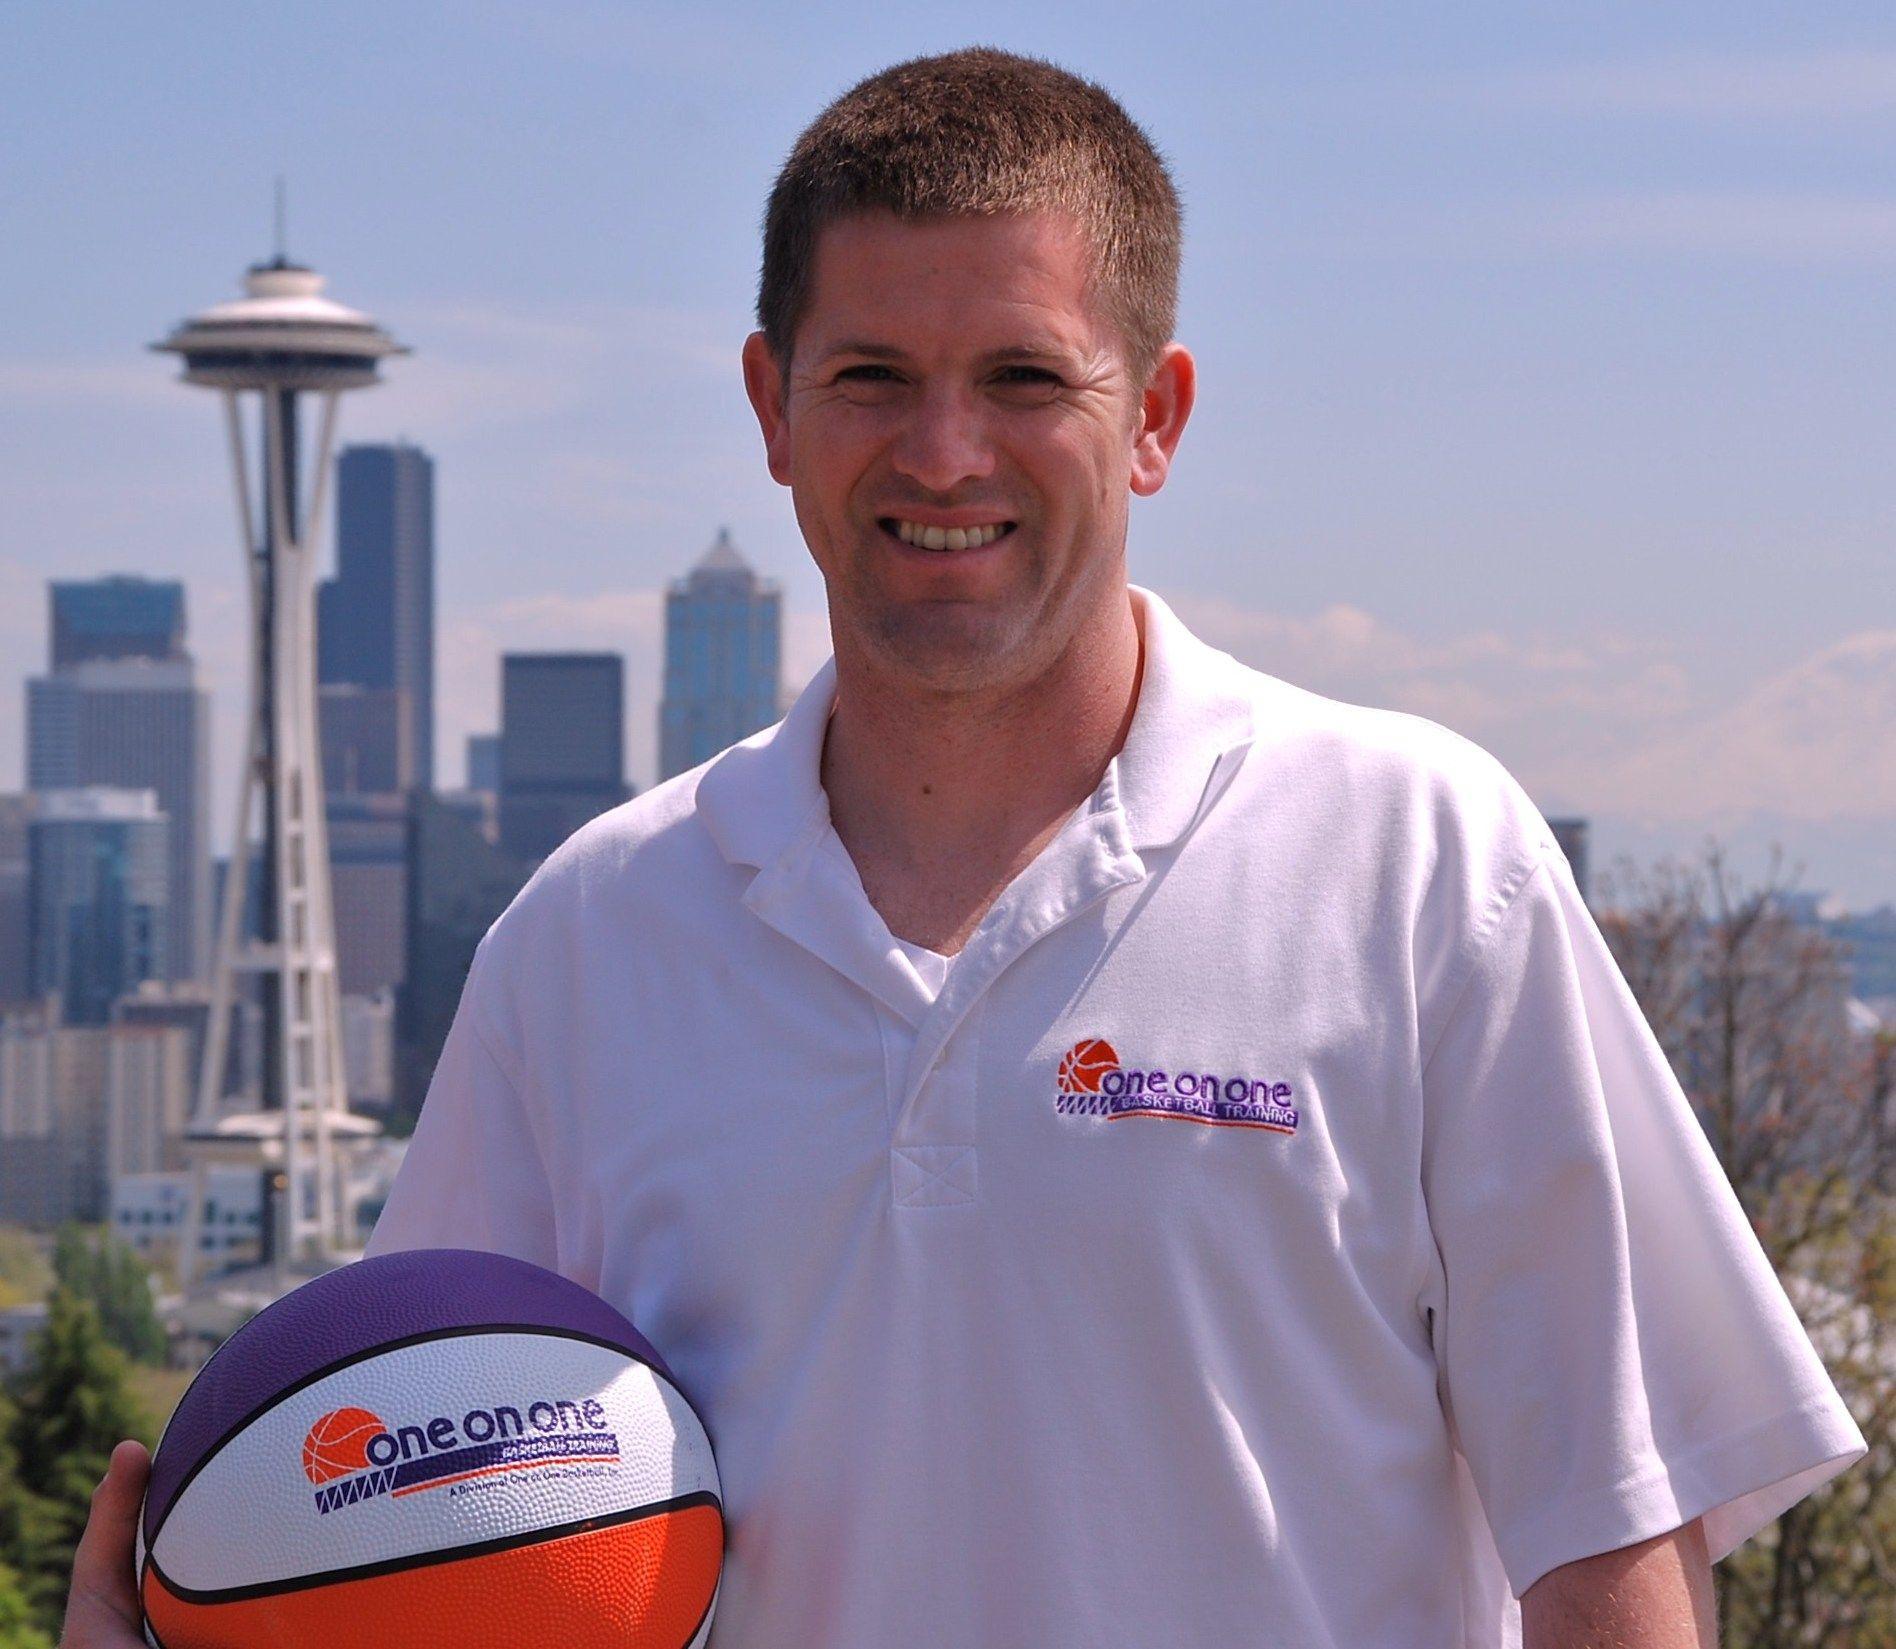 1on1 Basketball Seattle Washington Basketball Training Basketball Camps Basketball Club Teams P In 2020 Youth Basketball Basketball Camp Basketball Training